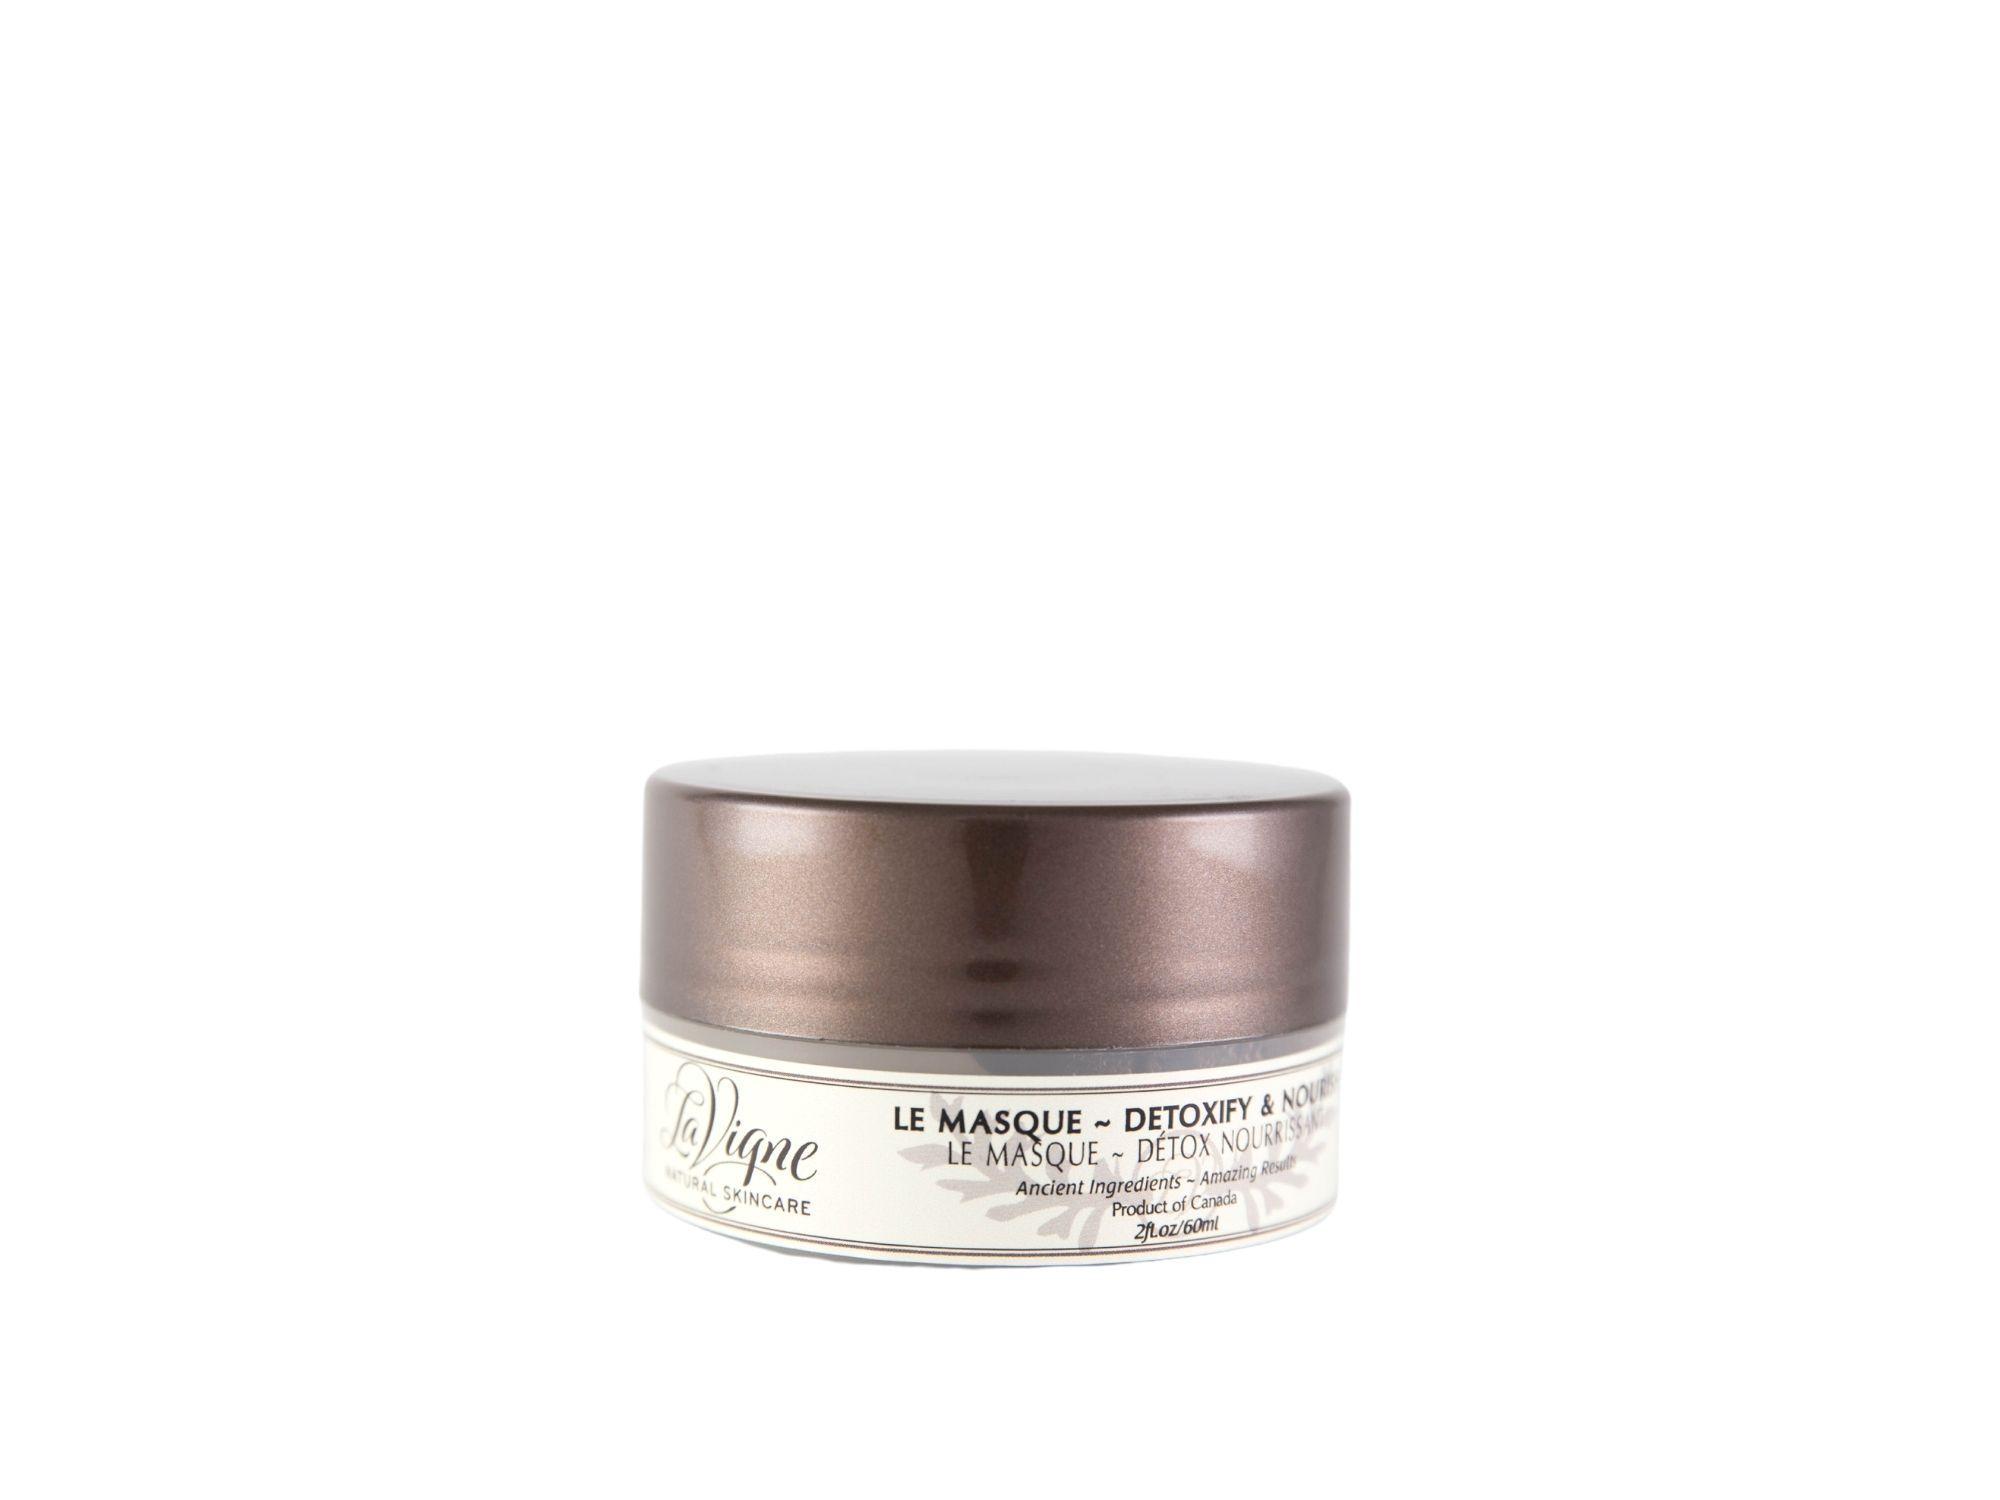 Le Masque Detoxify and Nourish Face Mask